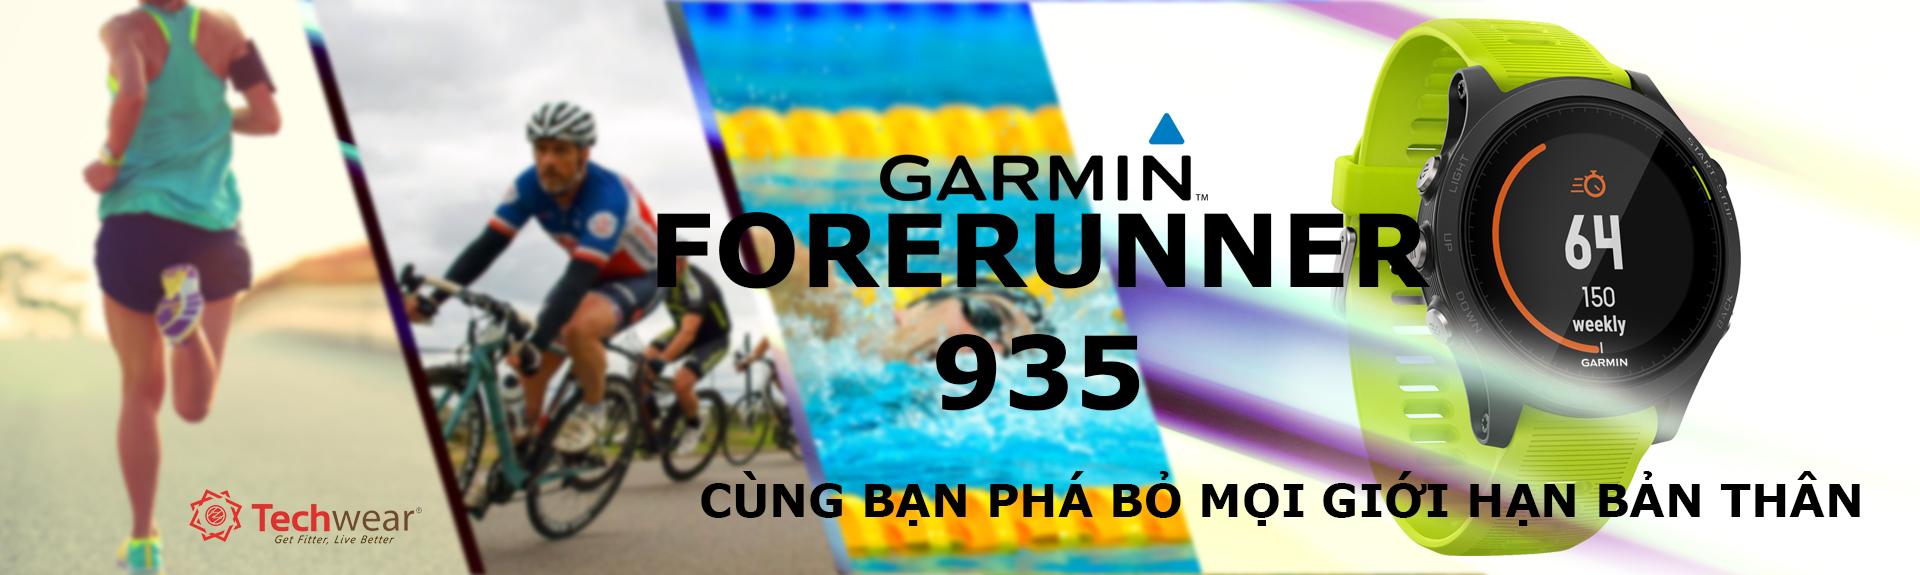 Garmin Forerunner 935